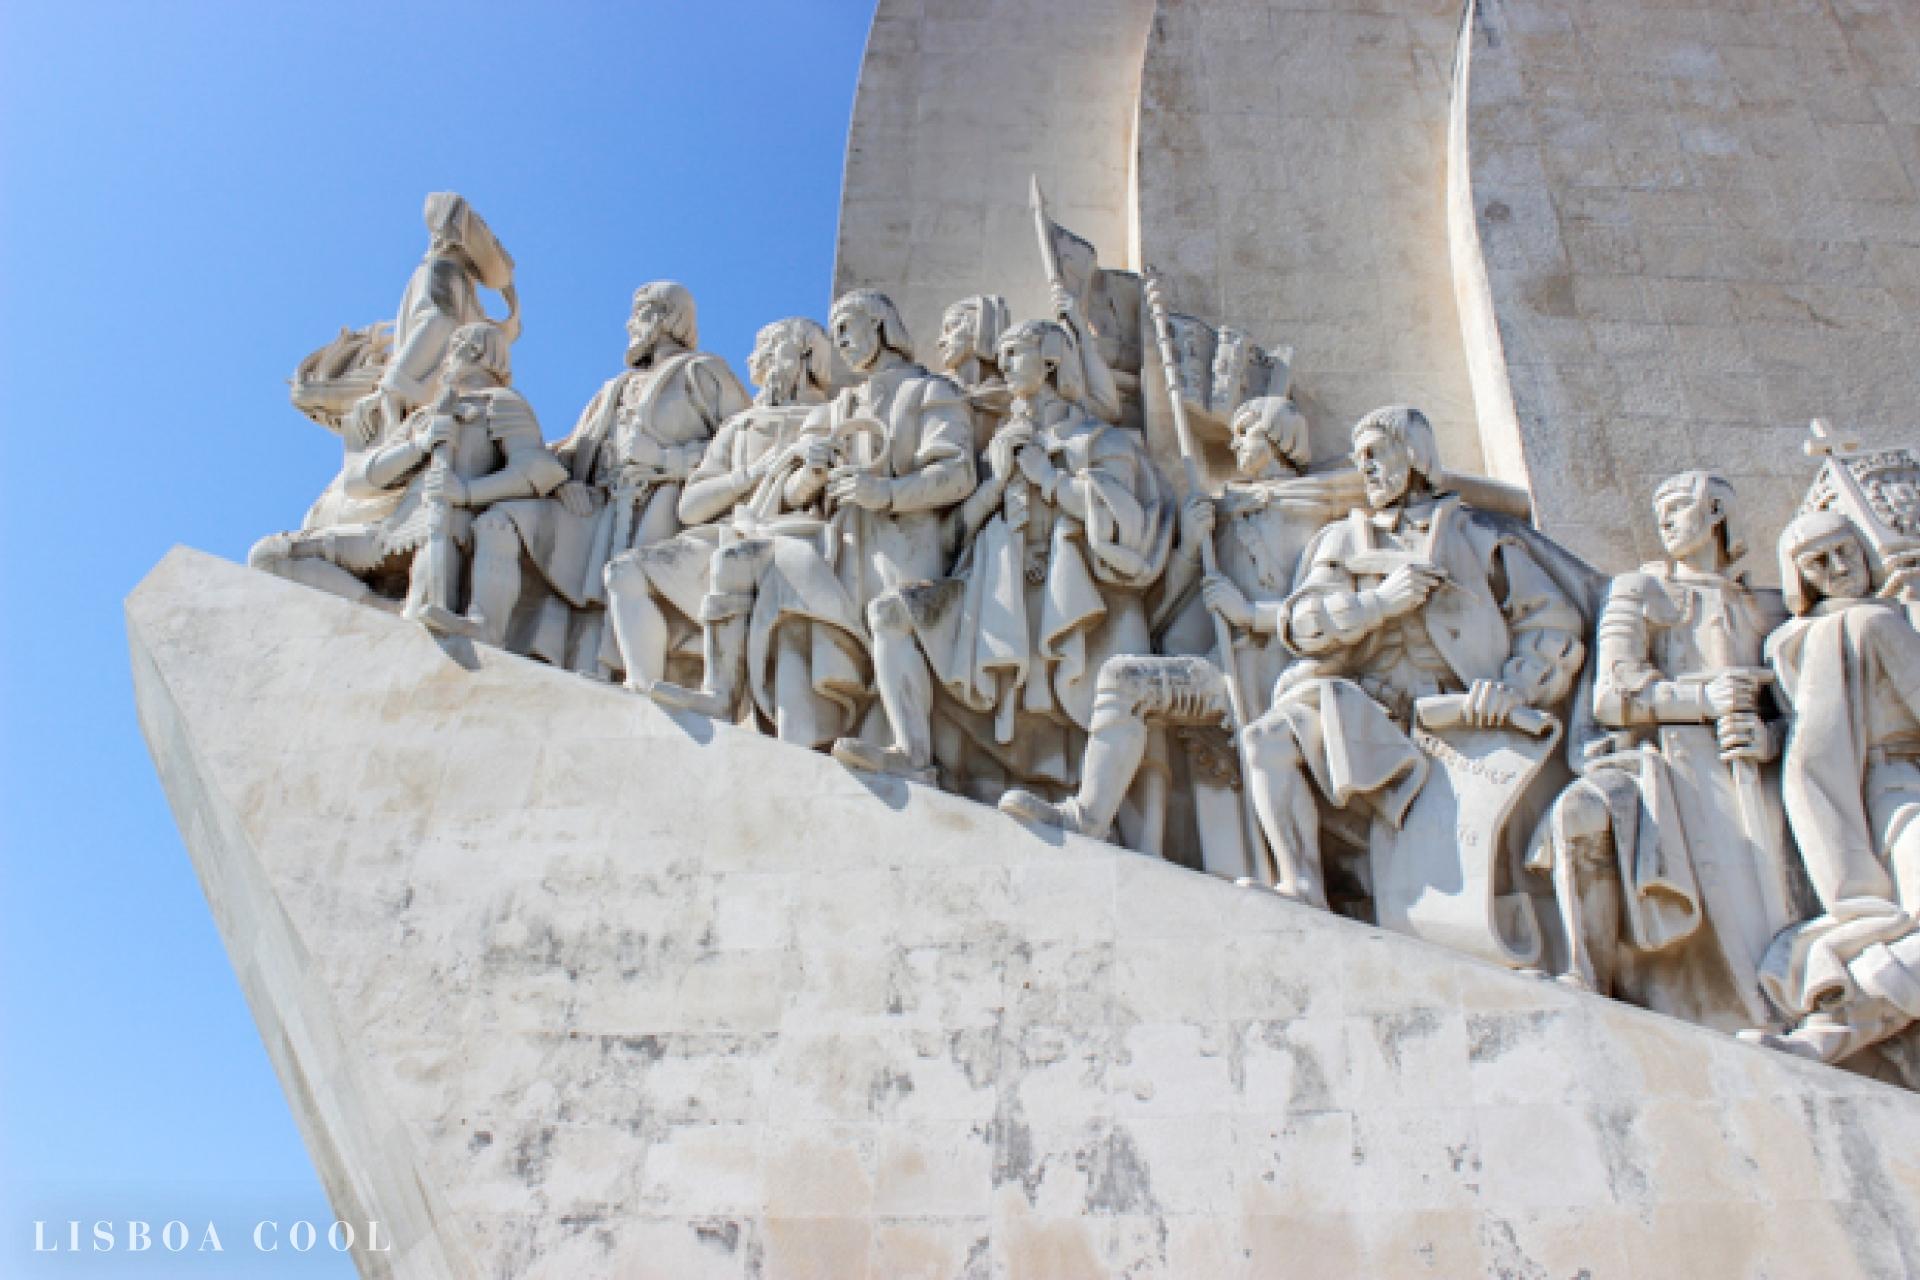 LisboaCool_Visit_Discoveries Monument